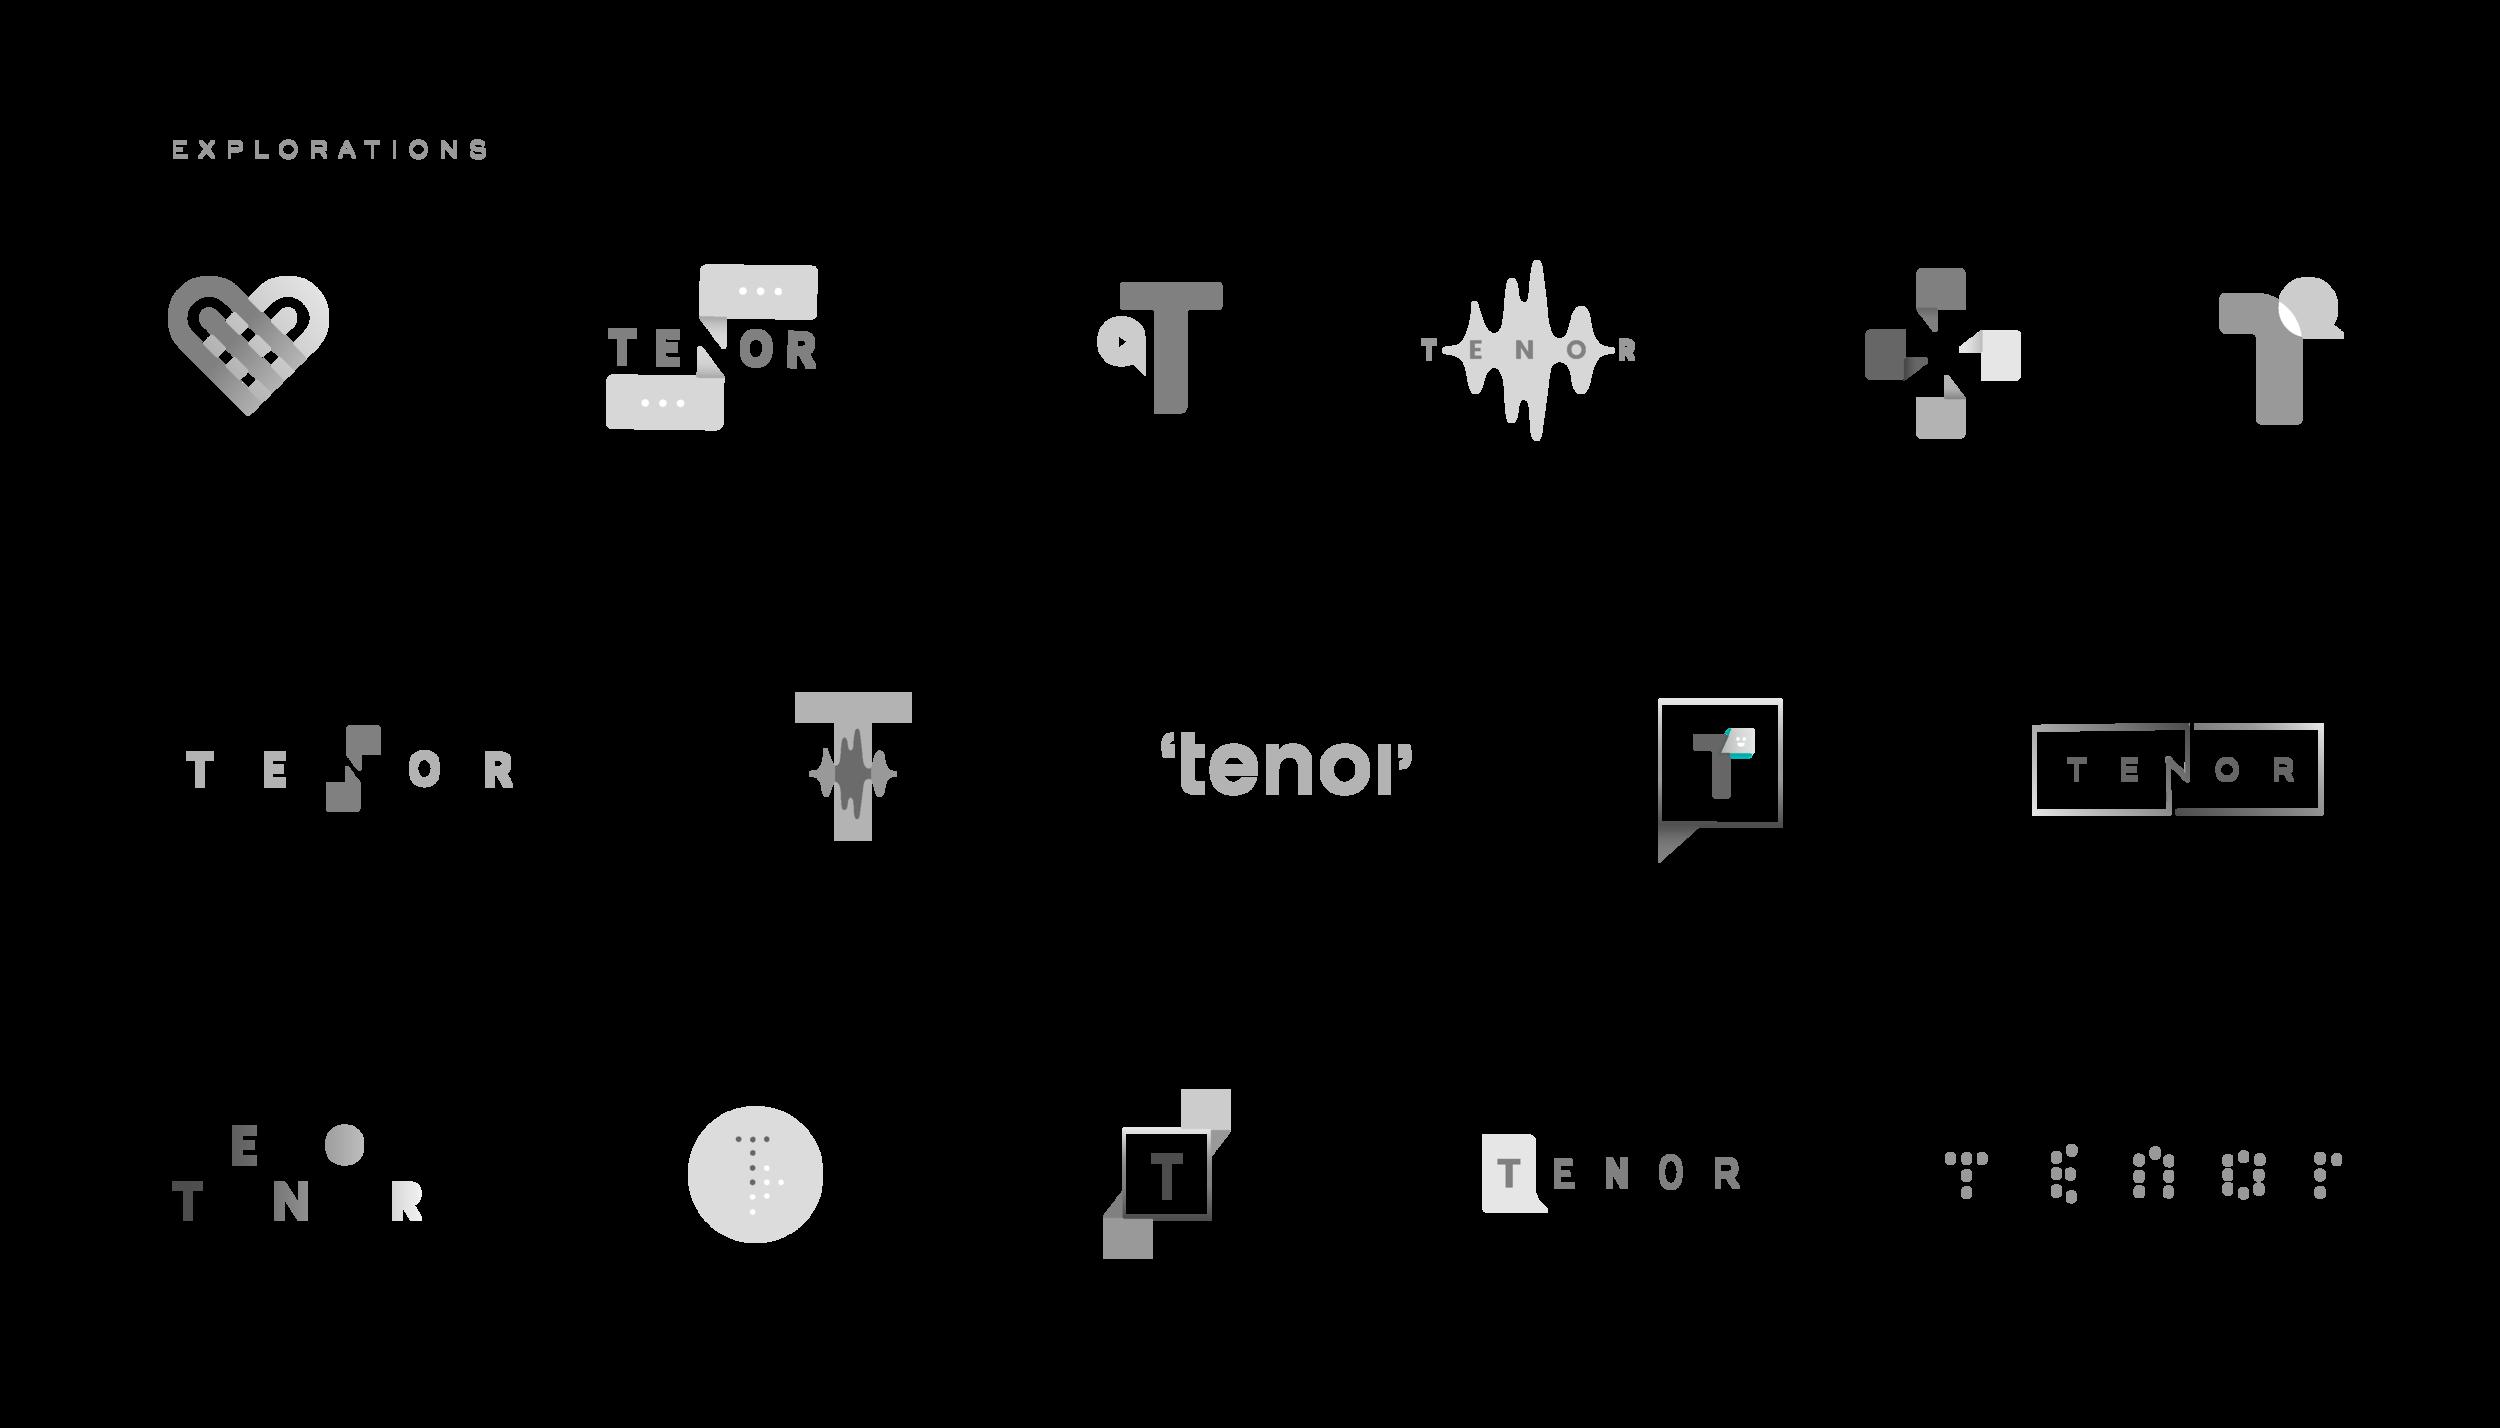 Tenor_Logo_Casestudy_Explorations.png